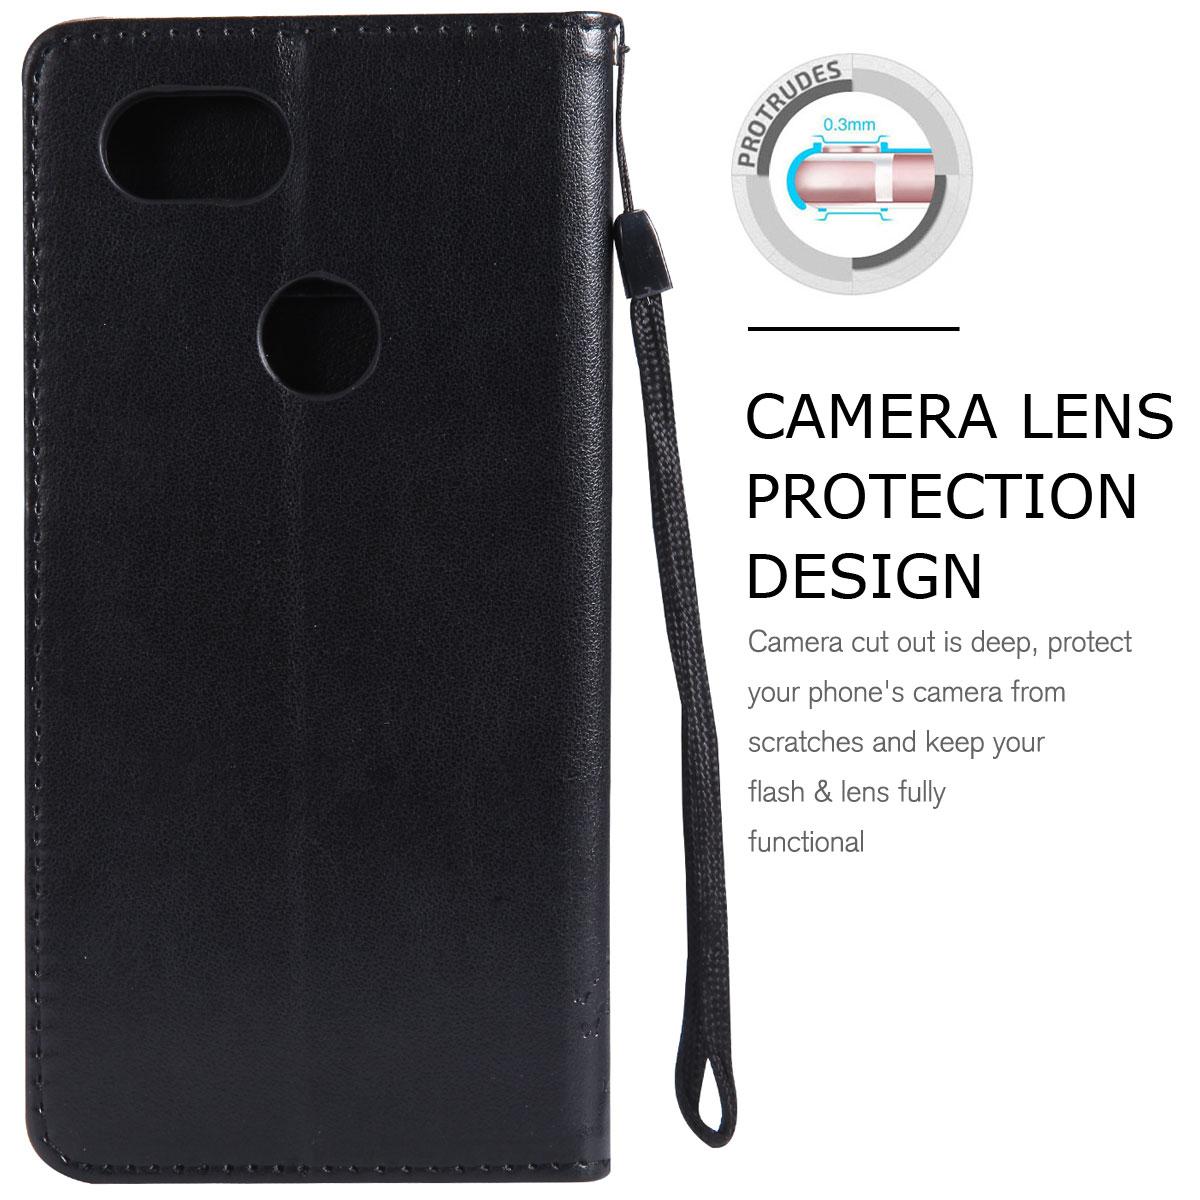 Magnetic-Leather-Credit-Card-Holder-Flip-Case-Cover-For-Google-Pixel-2-2-XL thumbnail 56